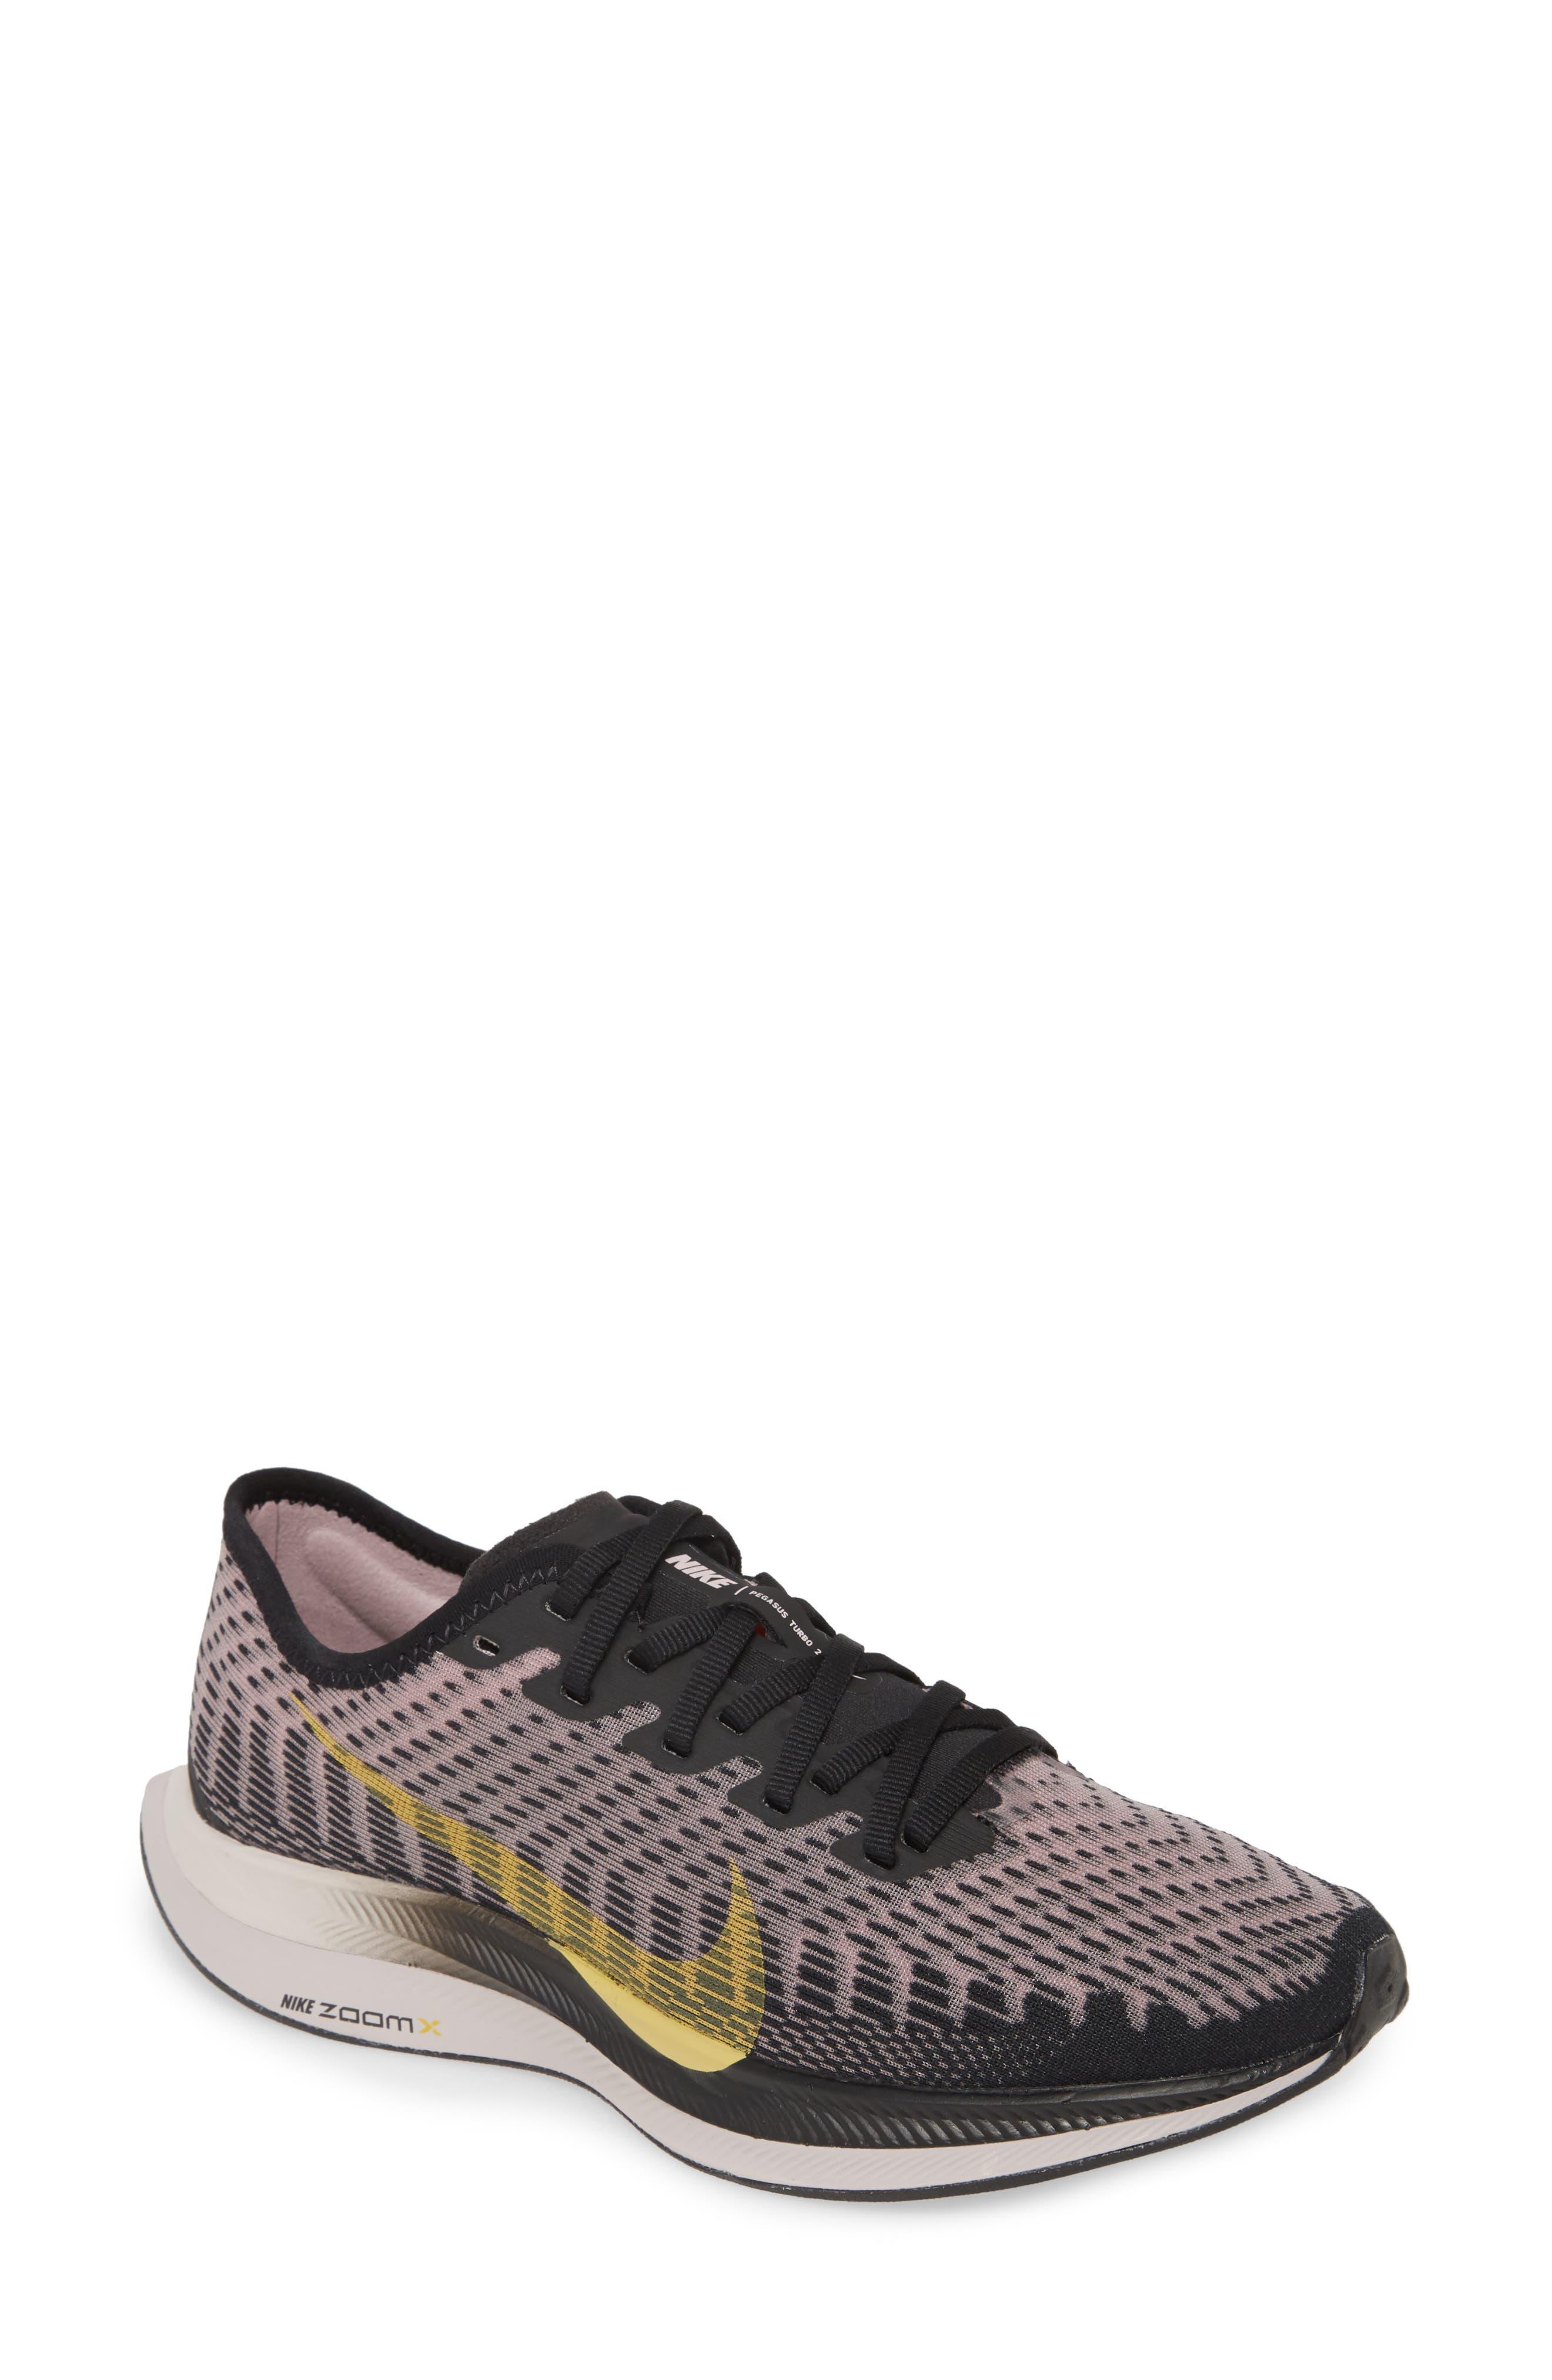 Image of Nike Zoom Pegasus Turbo 2 Running Sneaker